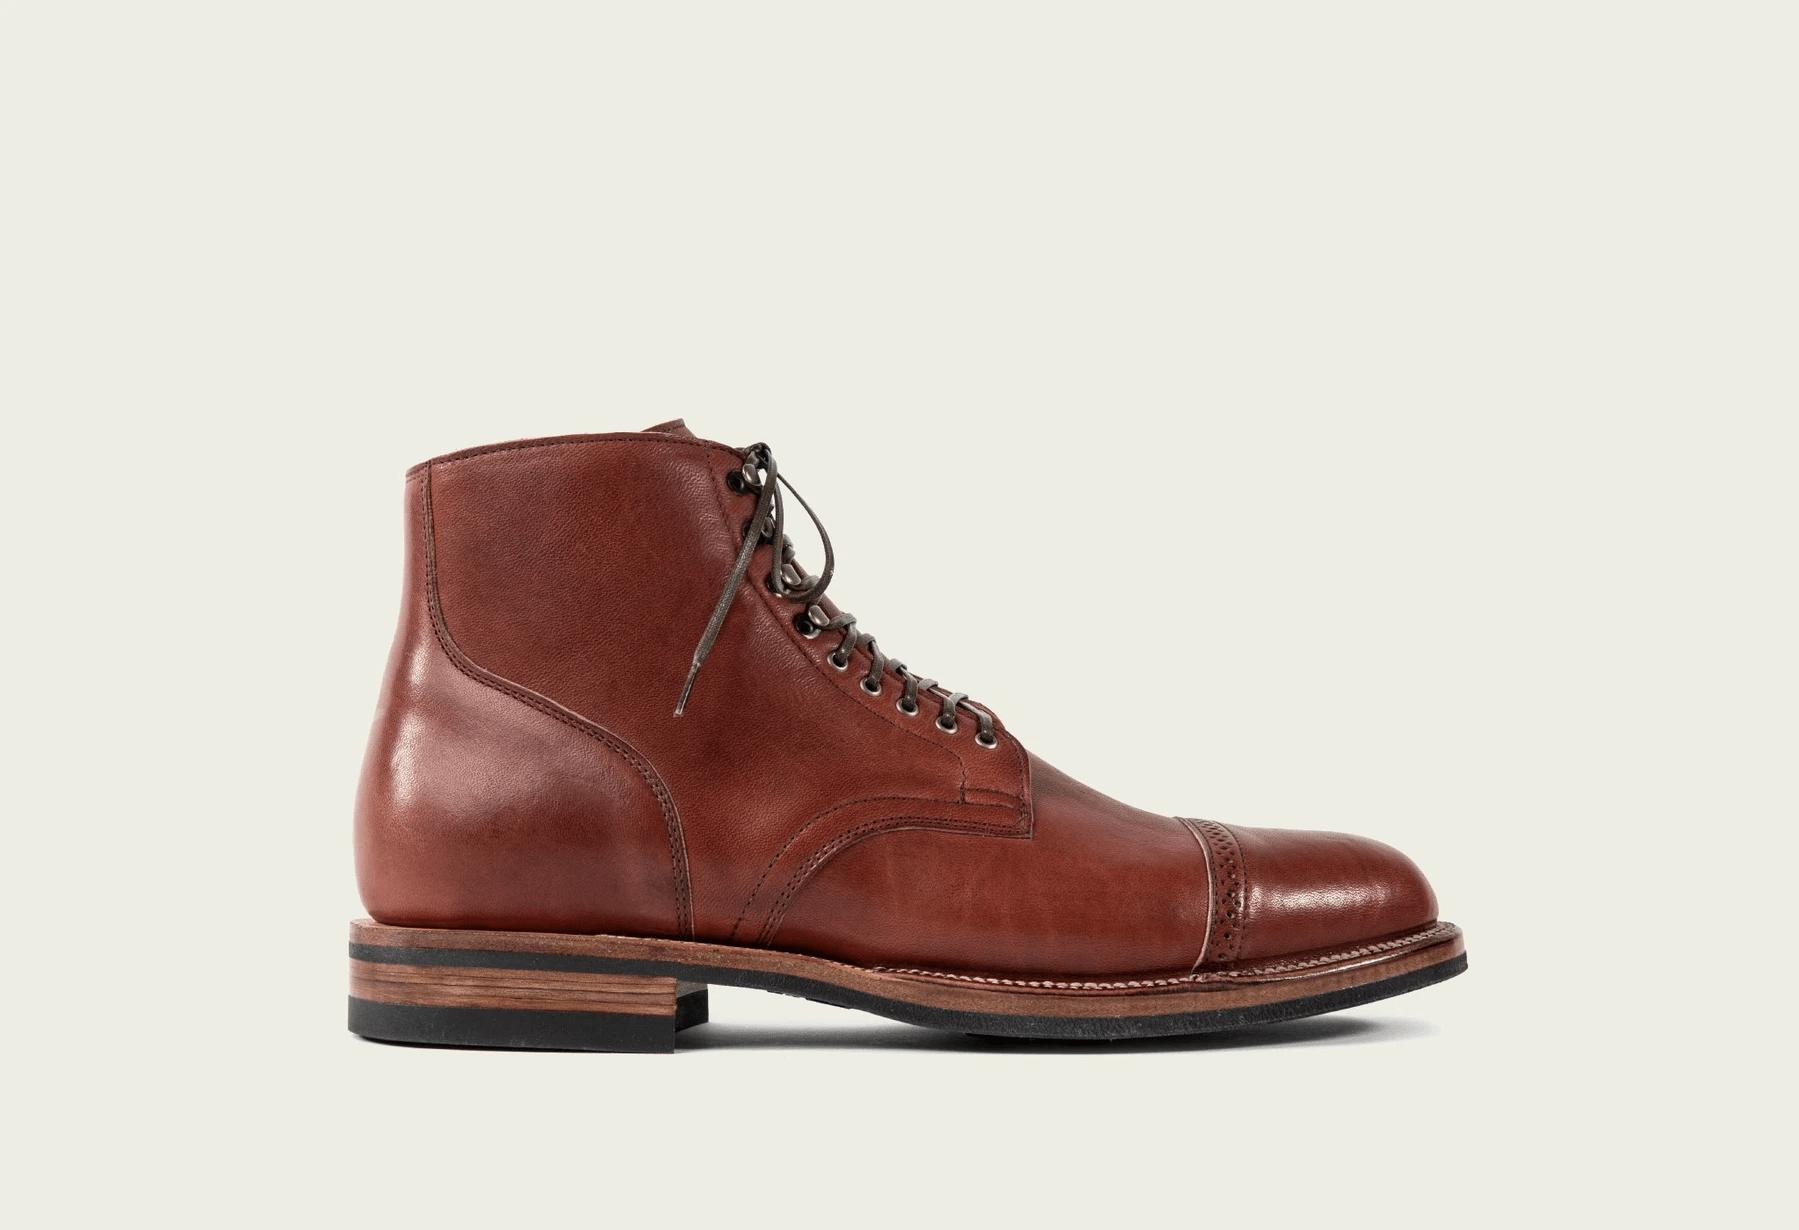 Viberg Service Boots in Shinki Red Brown Latigo Horsehide